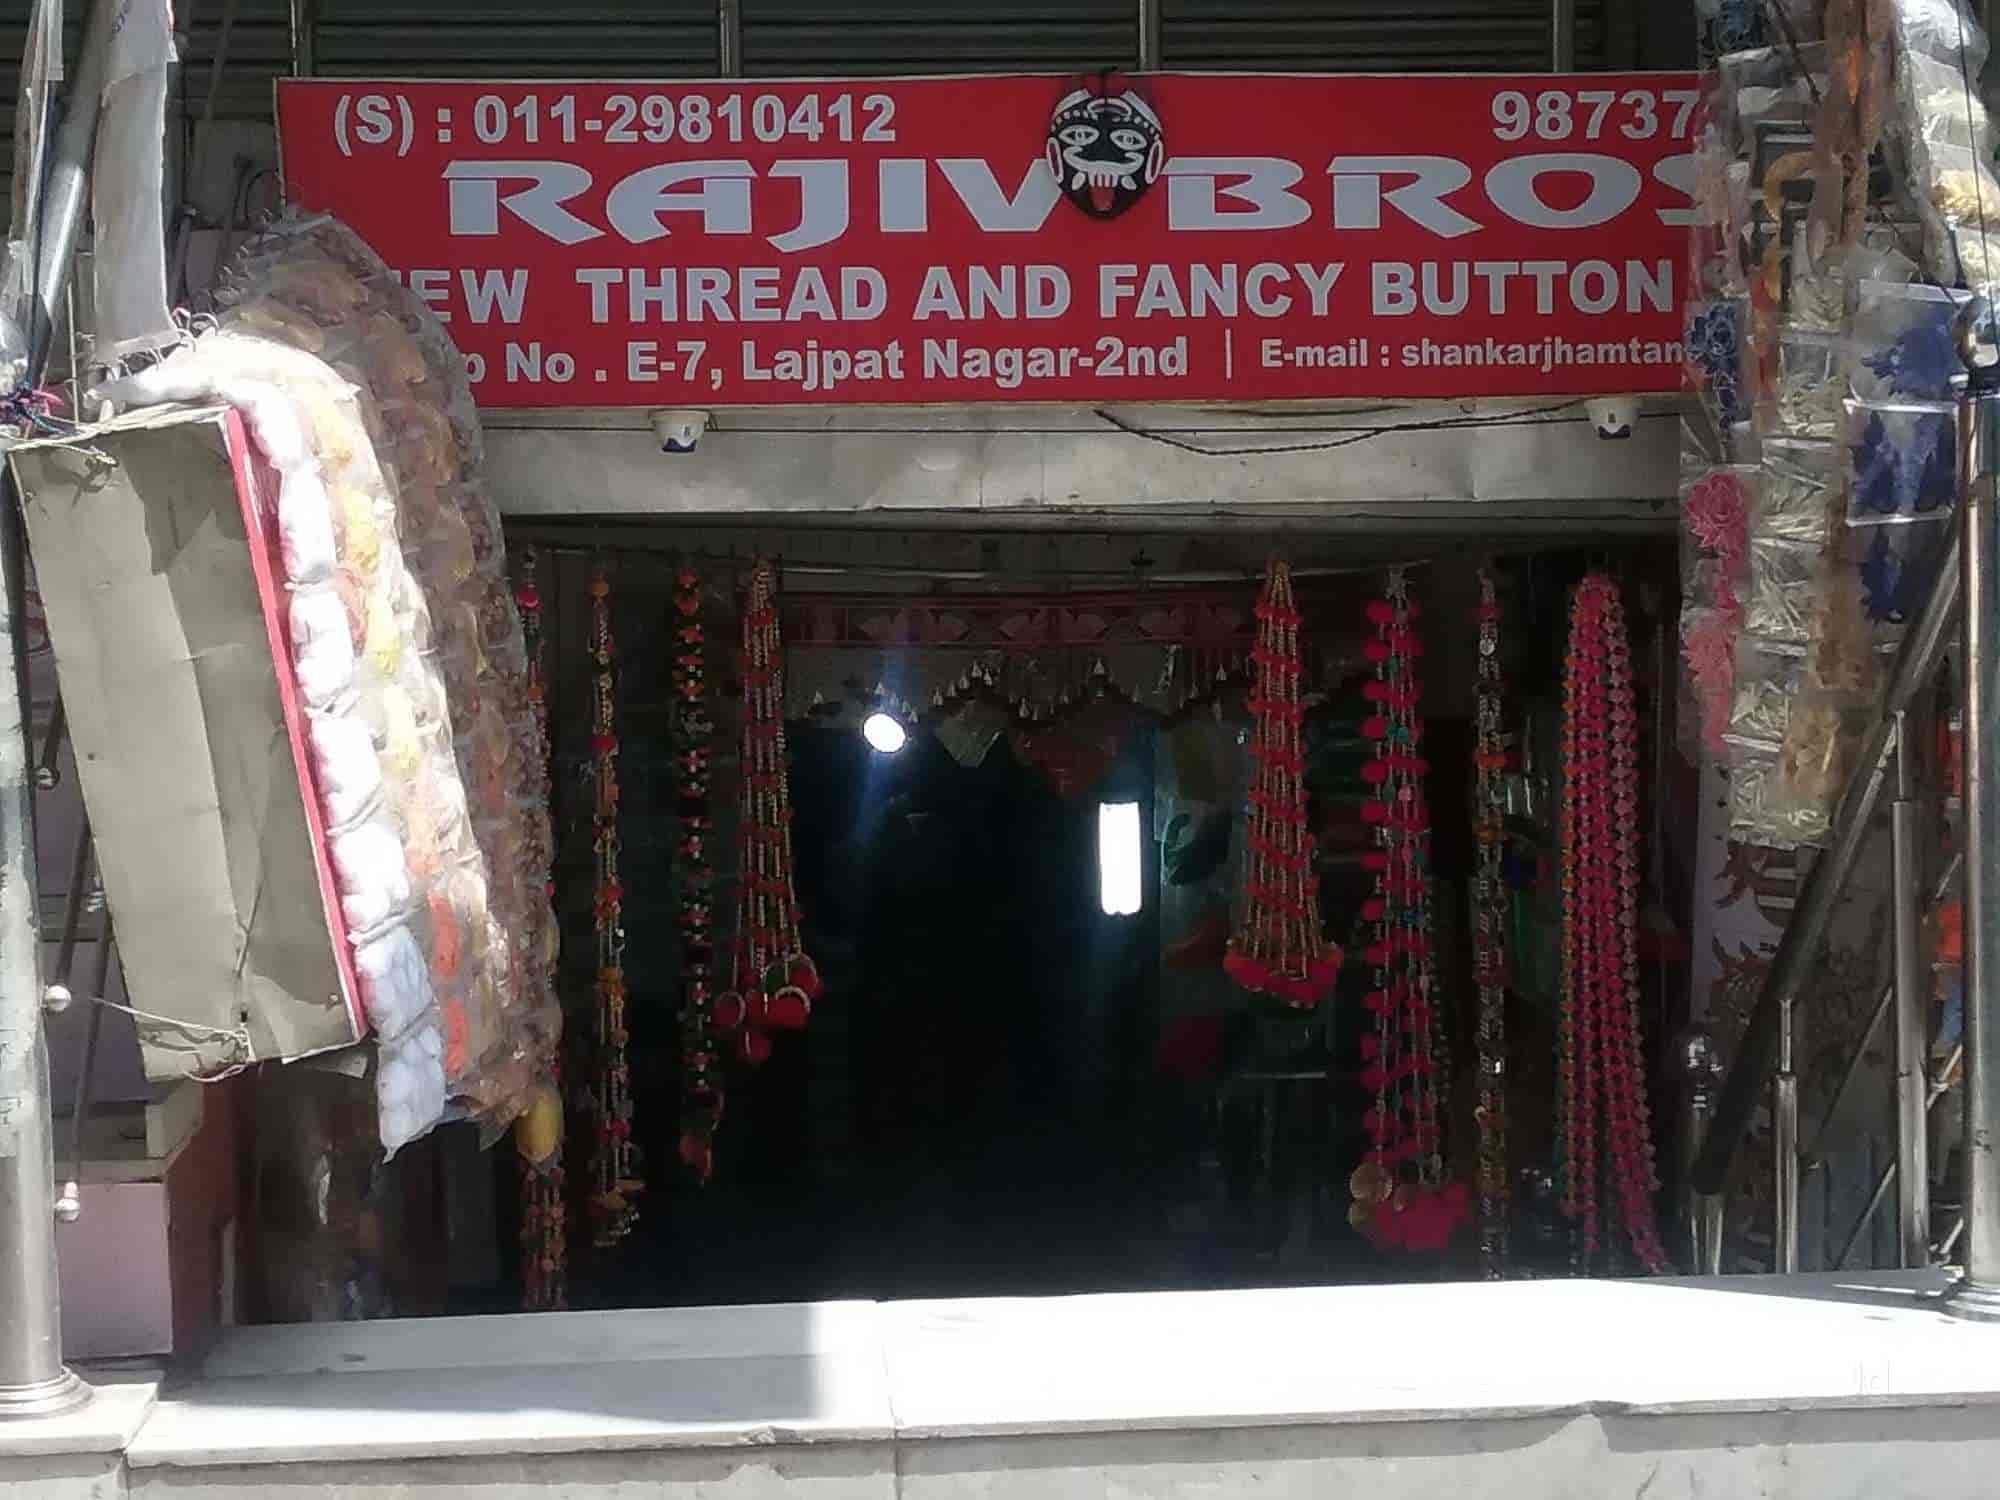 Rajiv Bros Lajpat Nagar 2